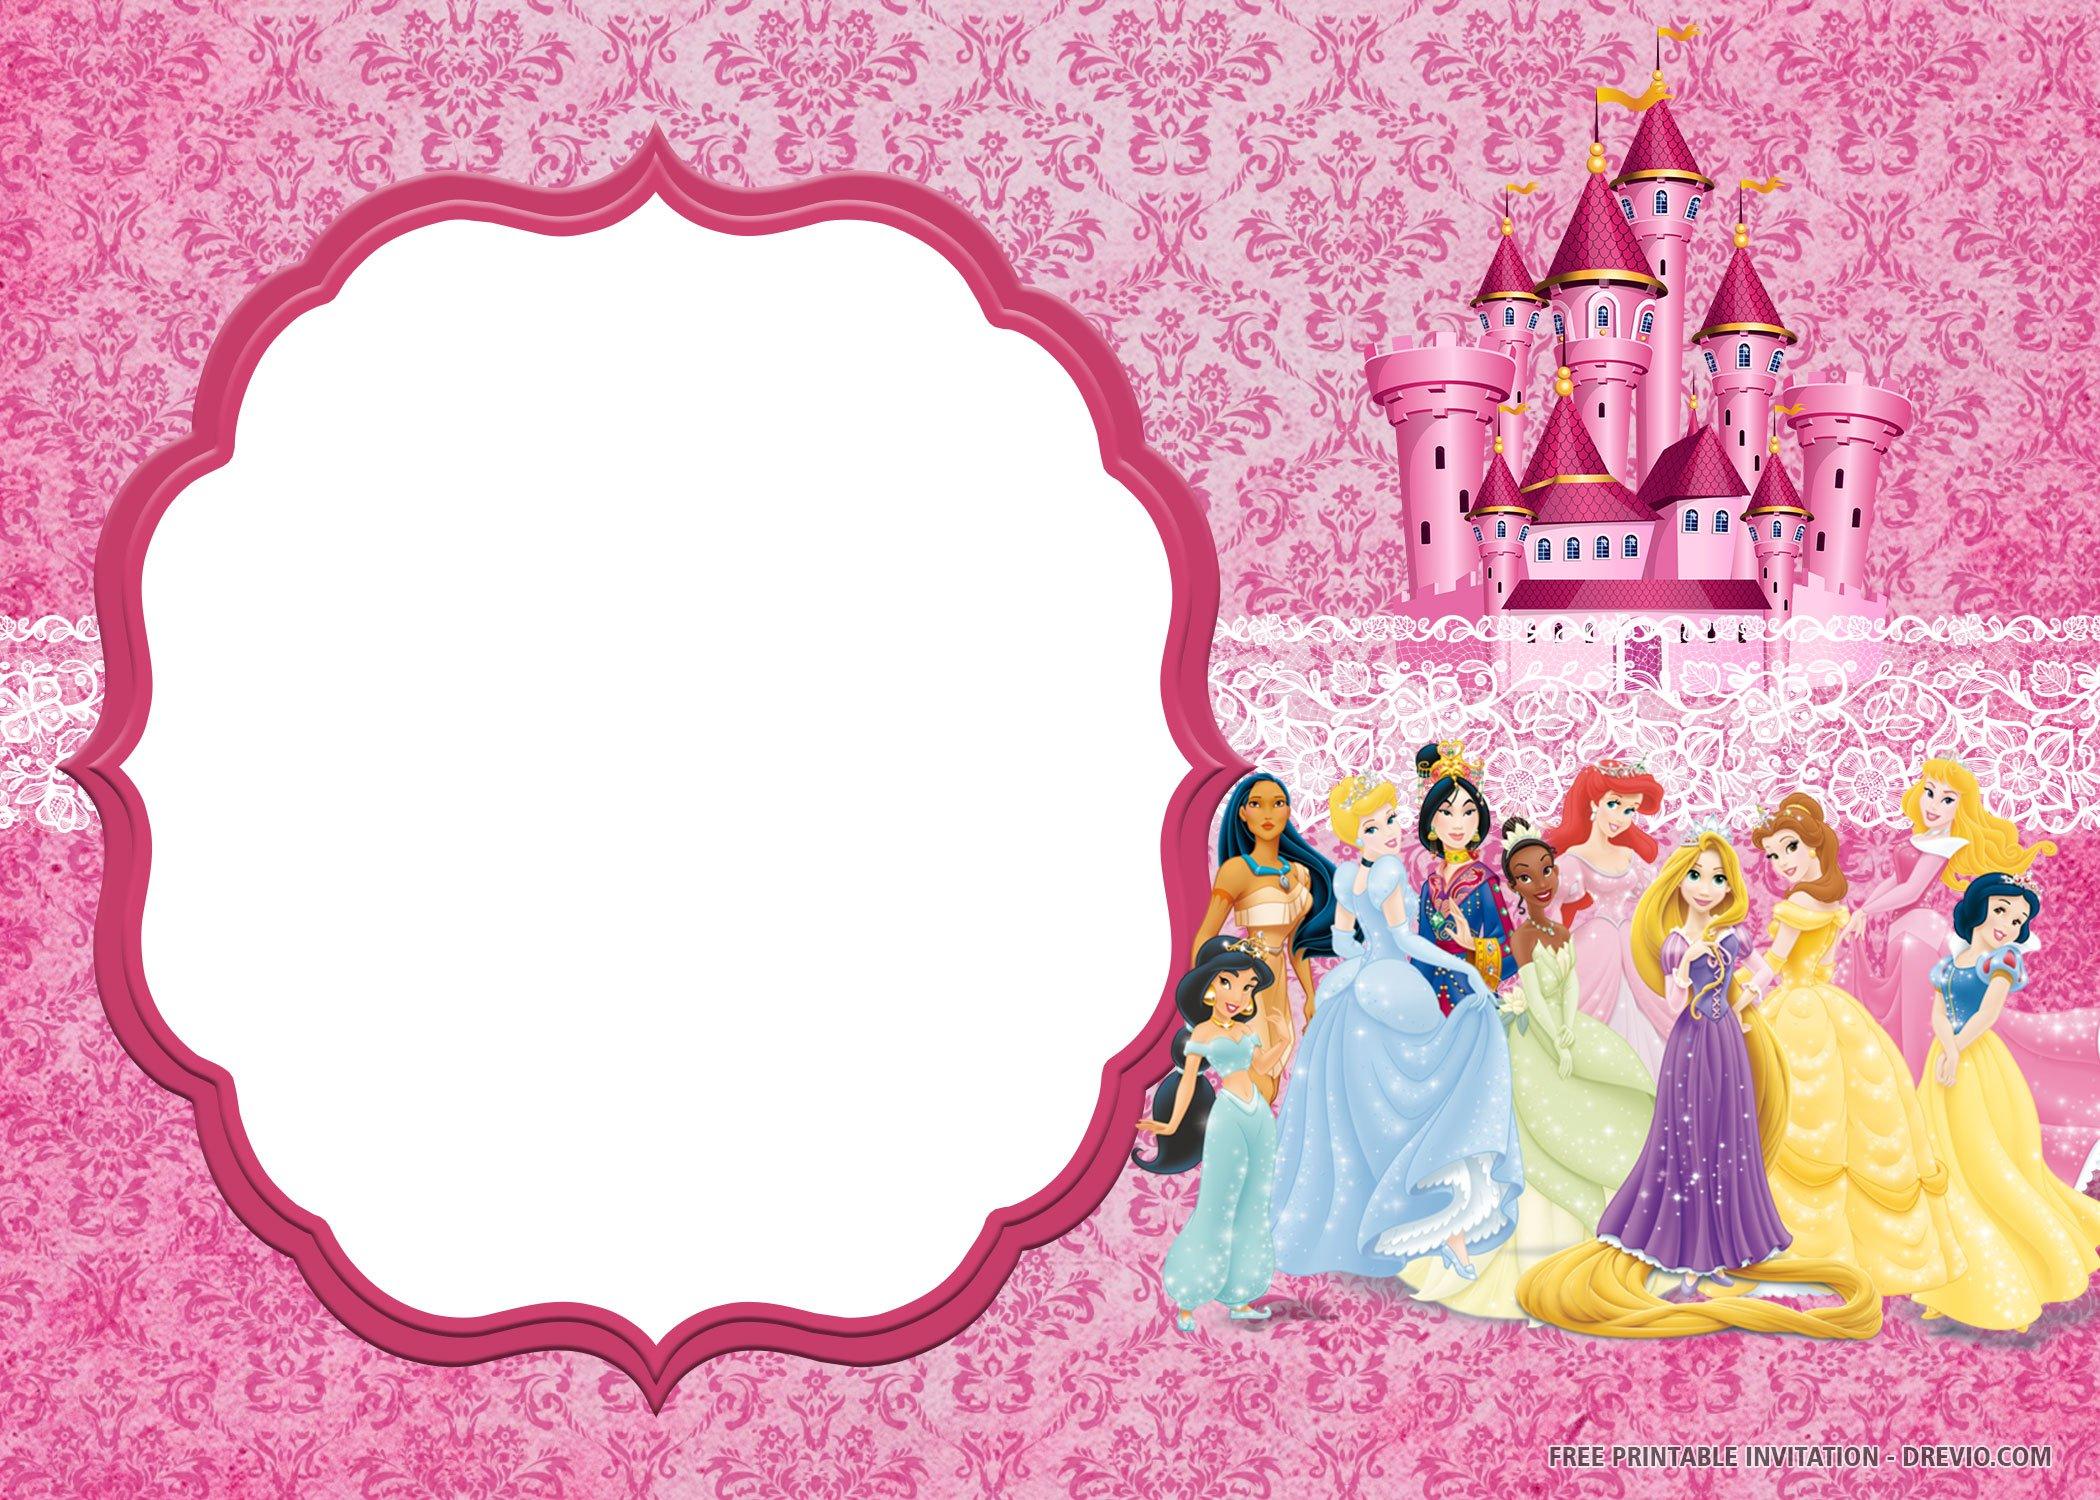 Free Printable Disney Princess Invitation Templates